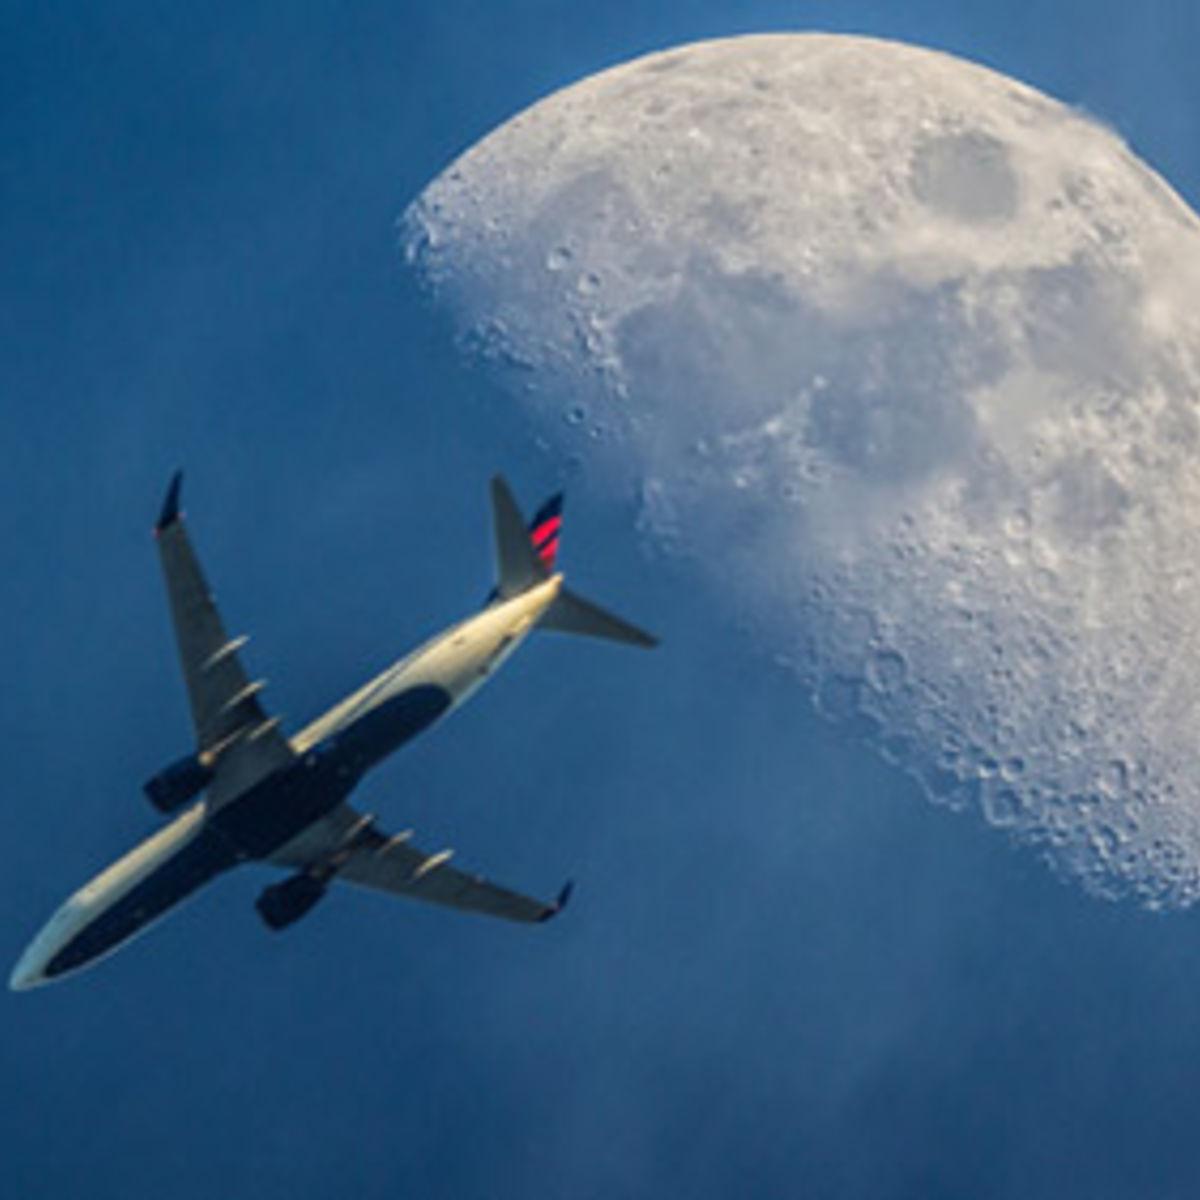 luxemburg_airplane_moon_354_0.jpg